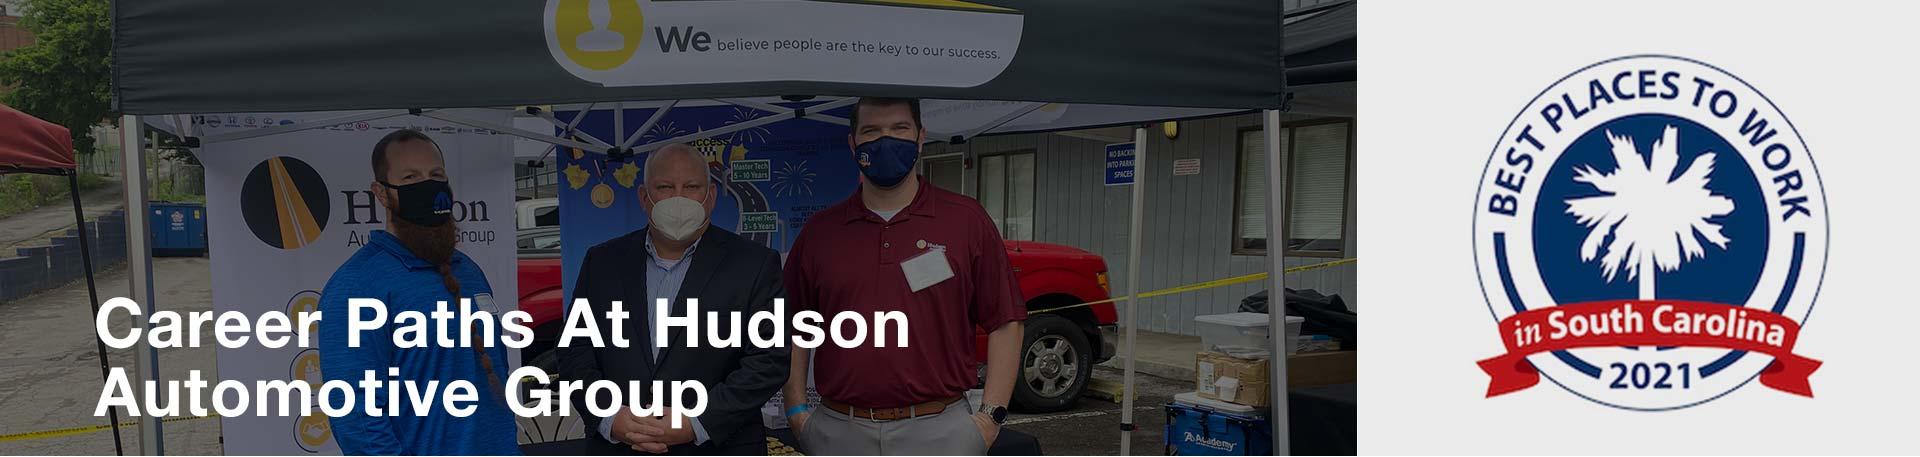 Career Paths At Hudson Automotive Group